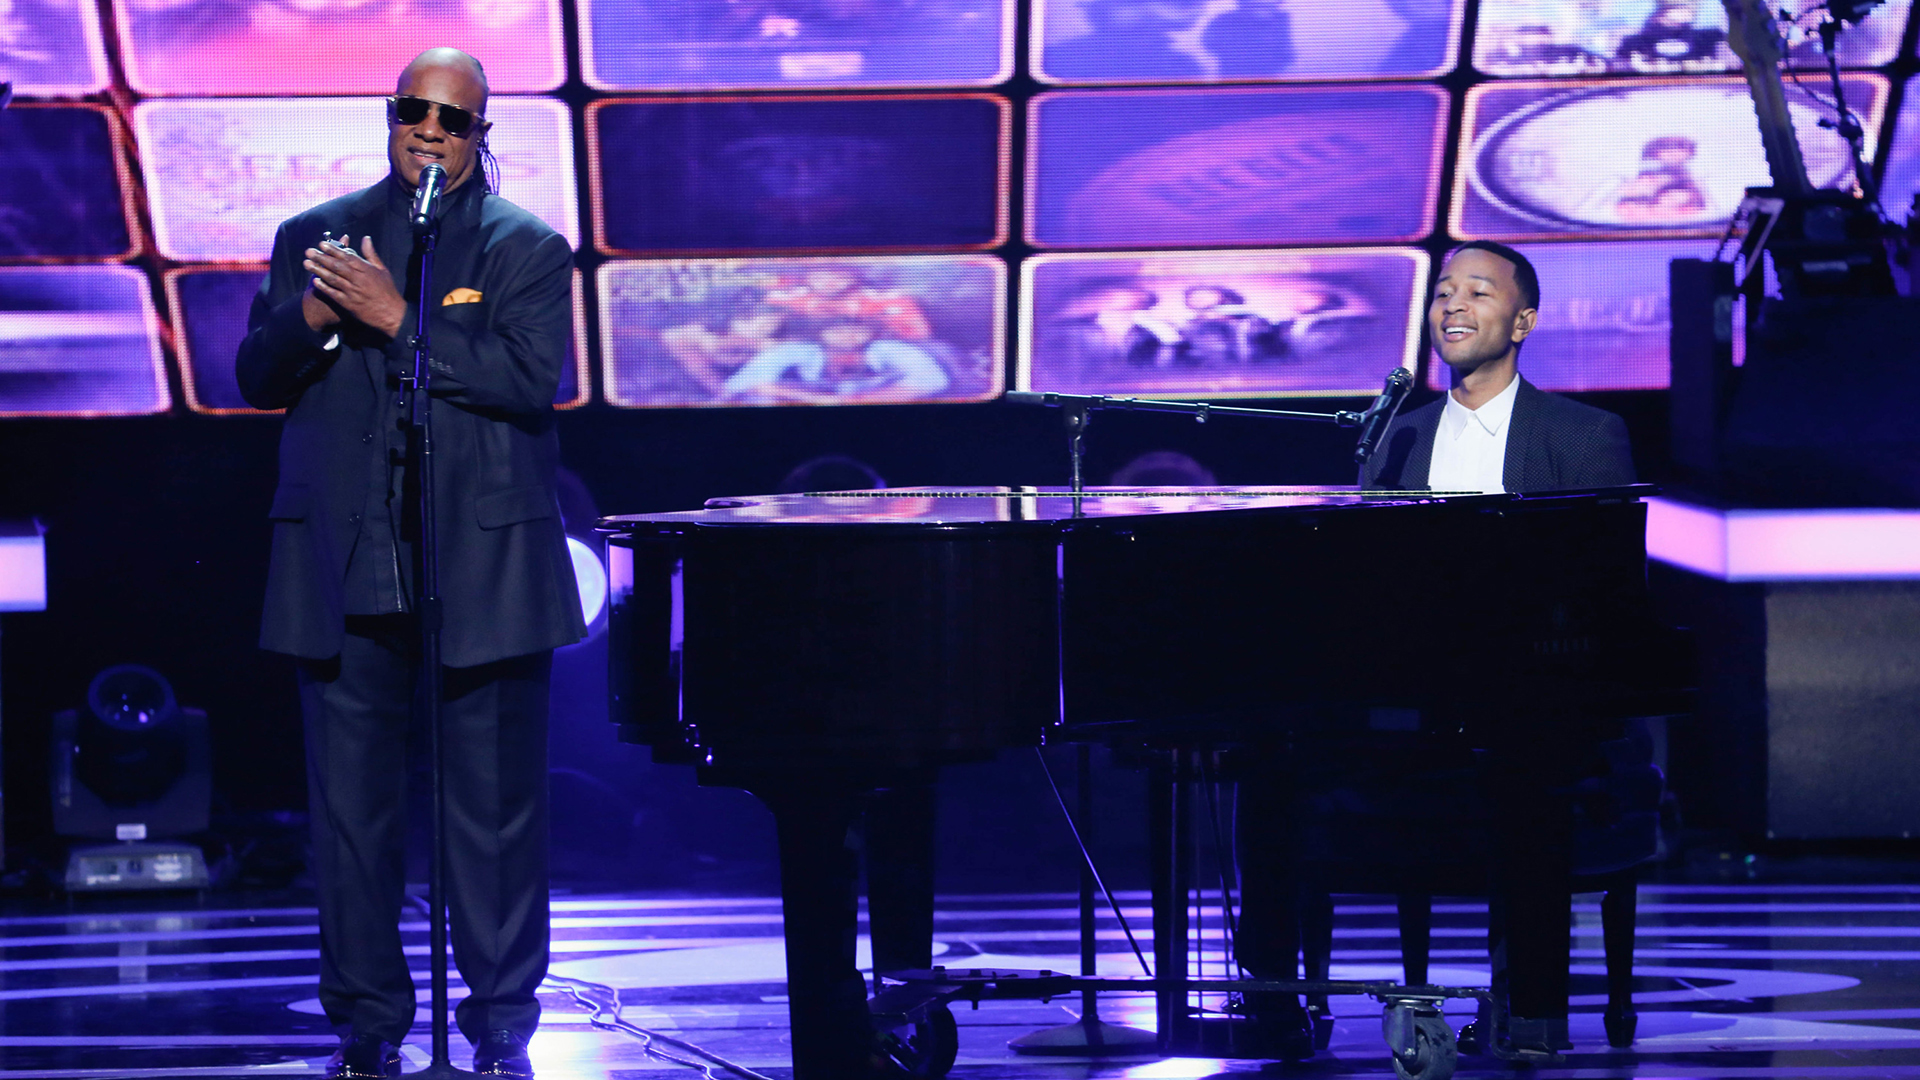 Stevie Wonder and John Legend perform